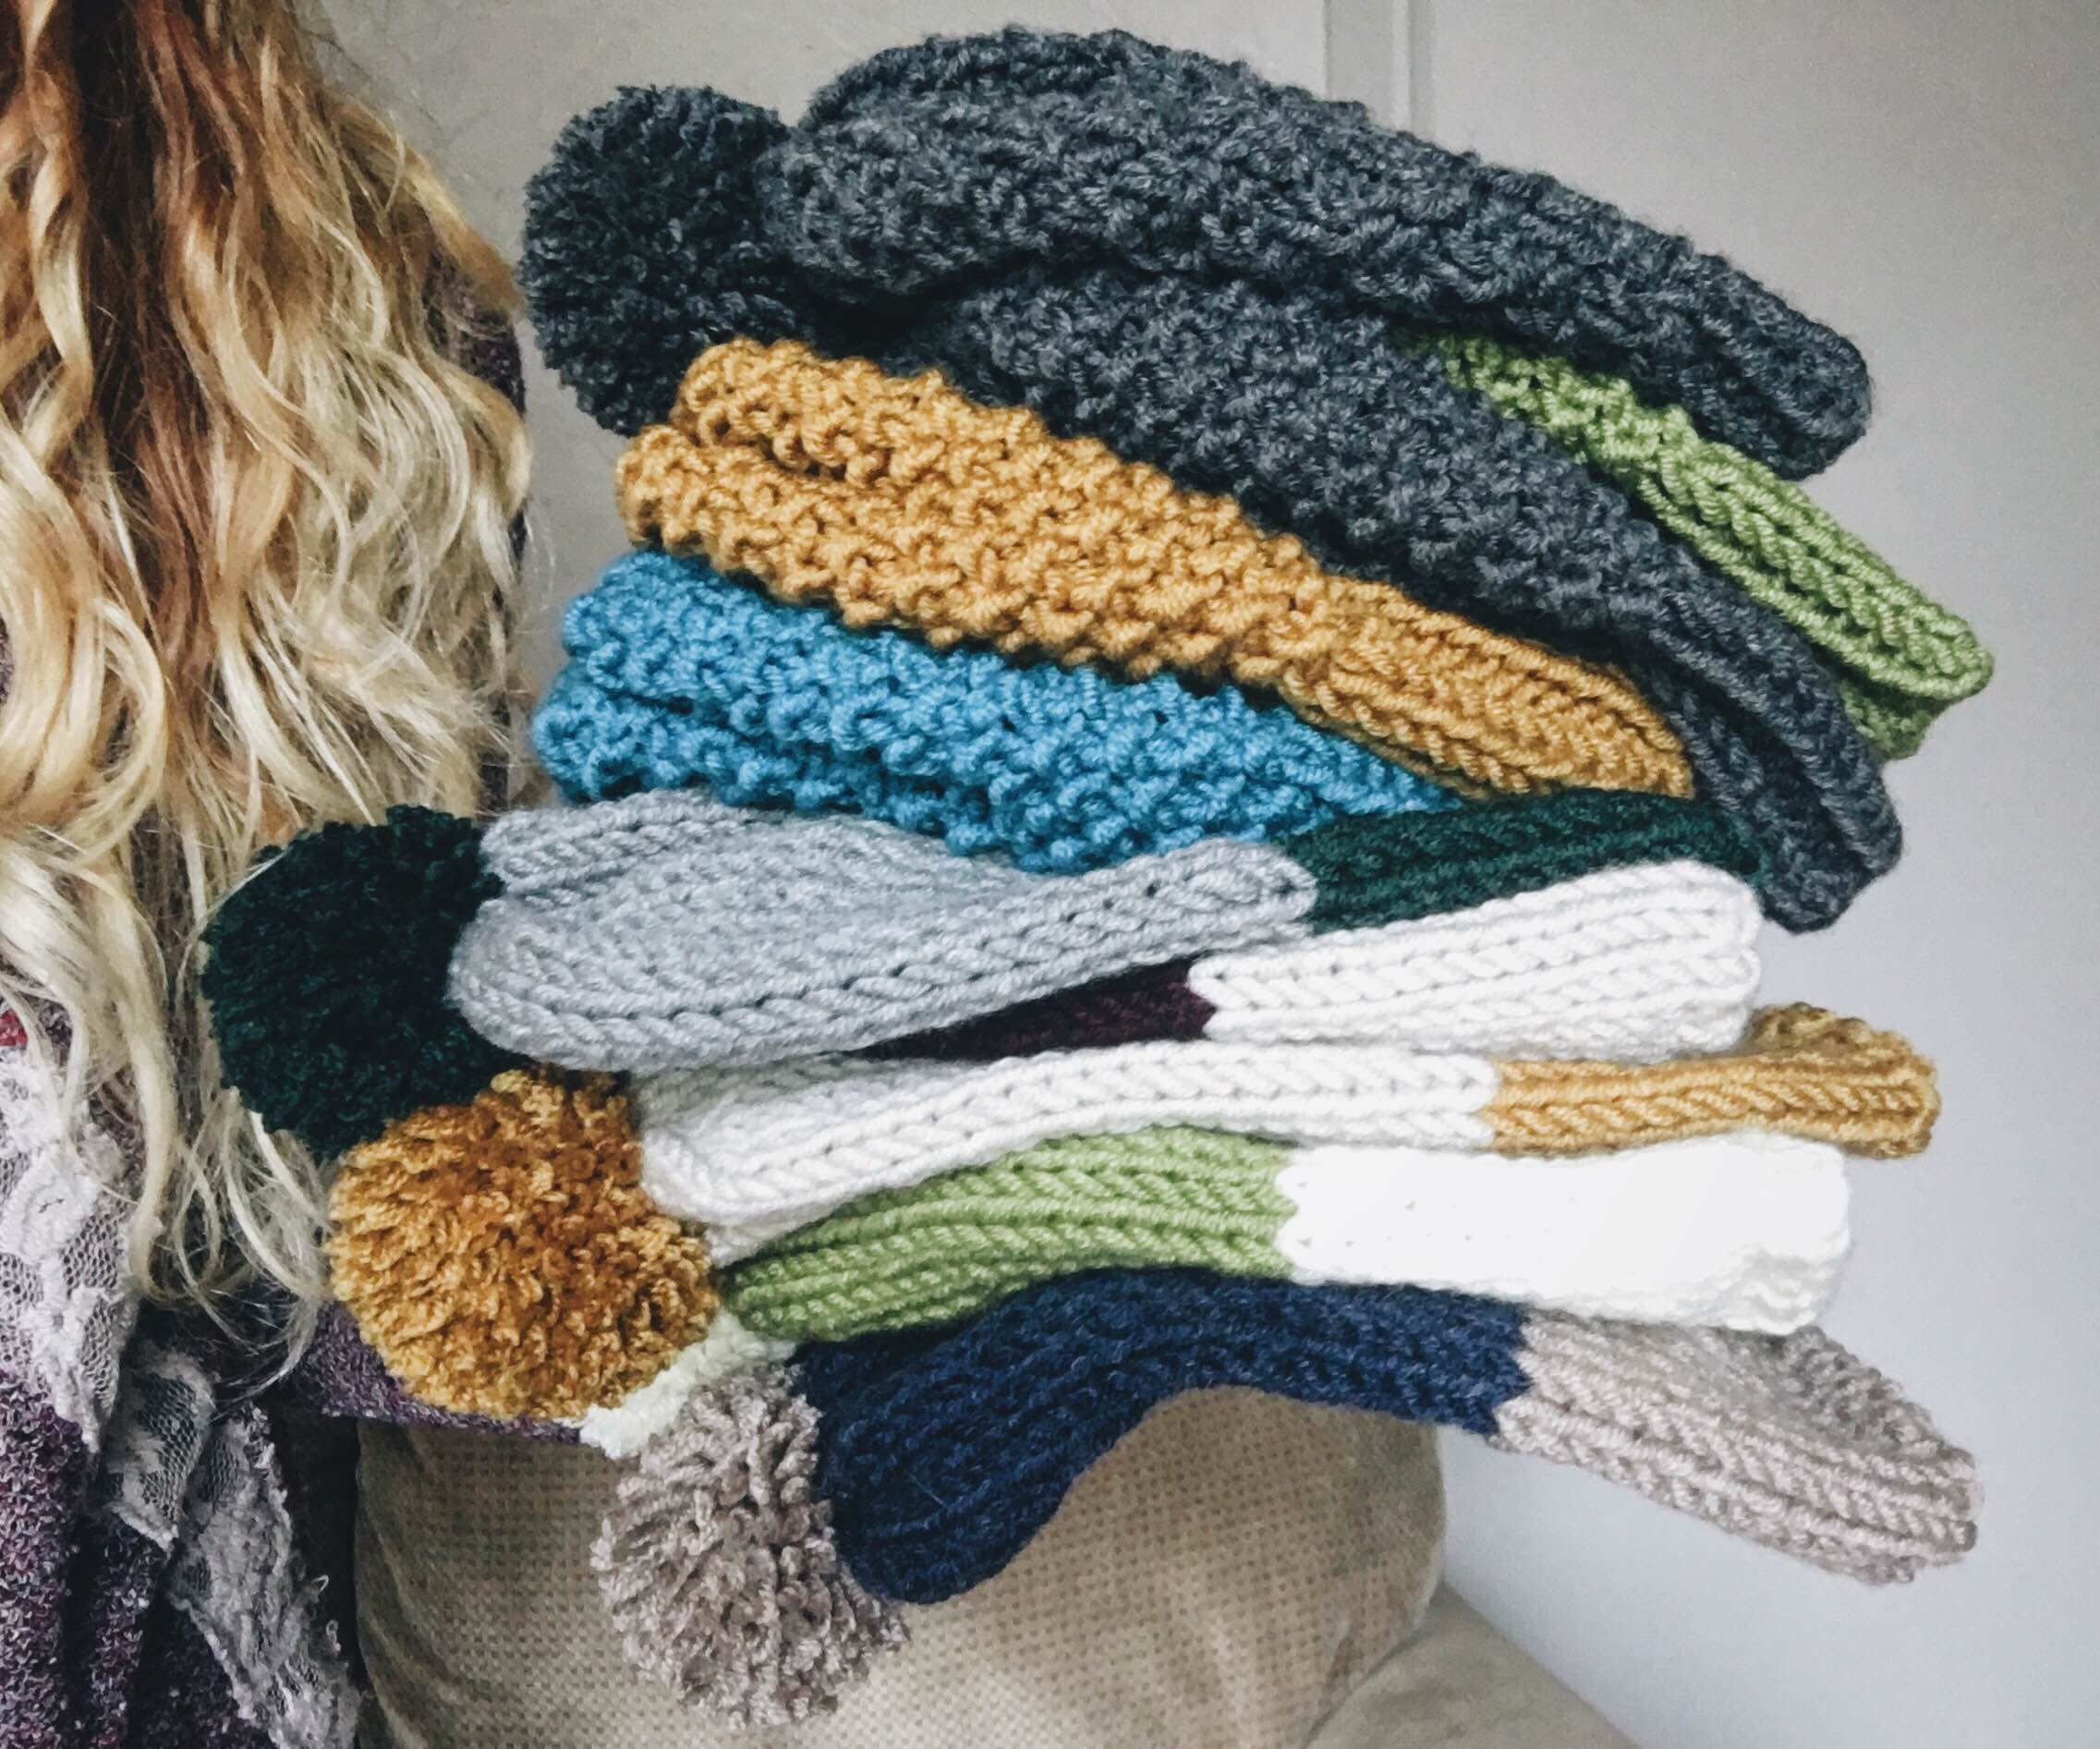 Kneedles & Leaves Knitwear